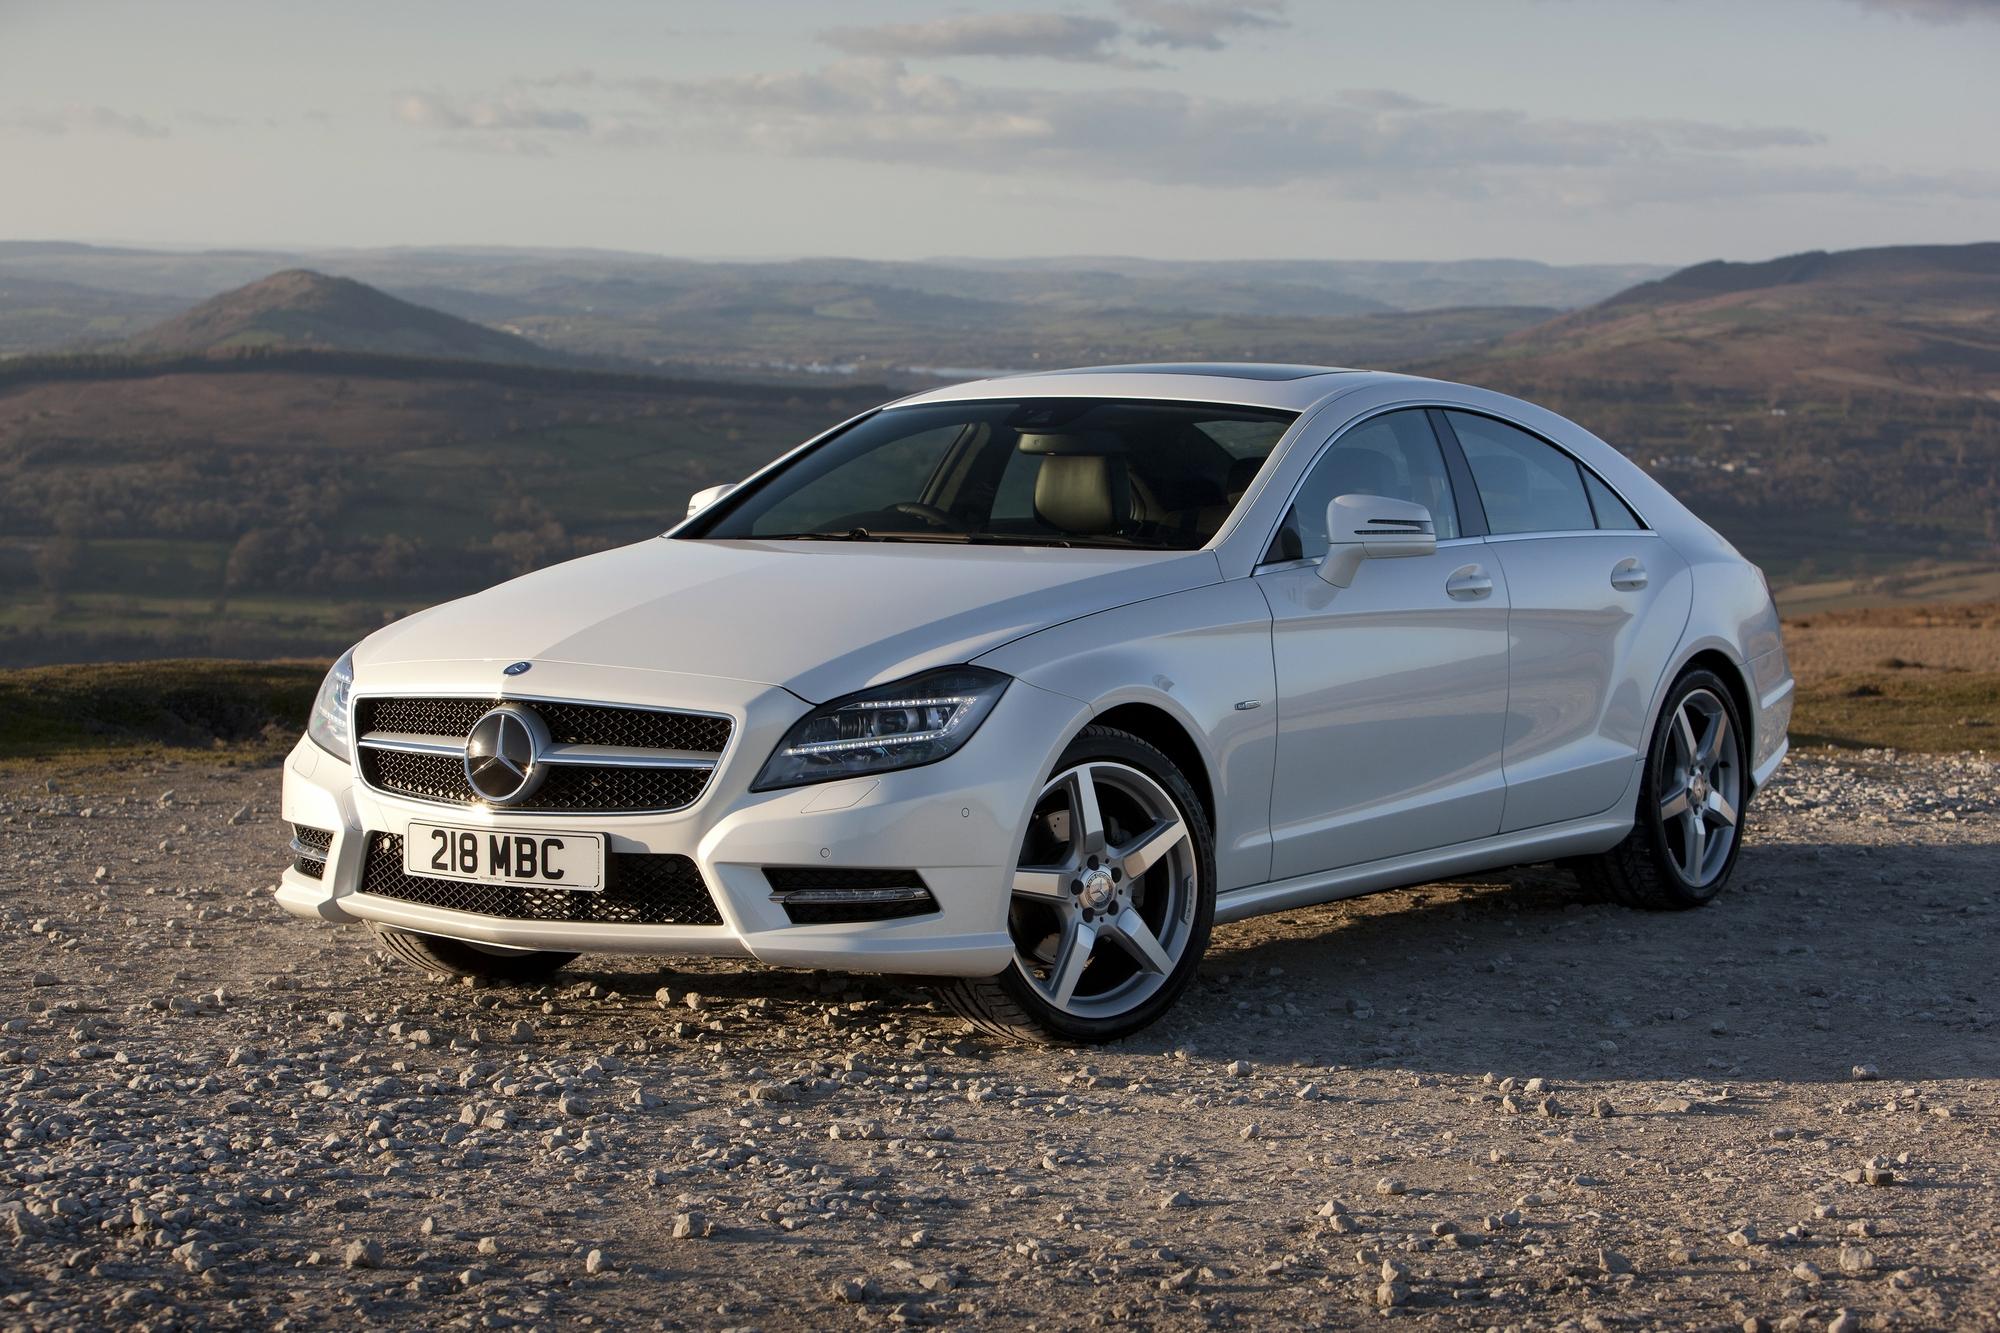 Mercedes Benz Cls 250 Cdi Blueefficiency Sport Slideshow